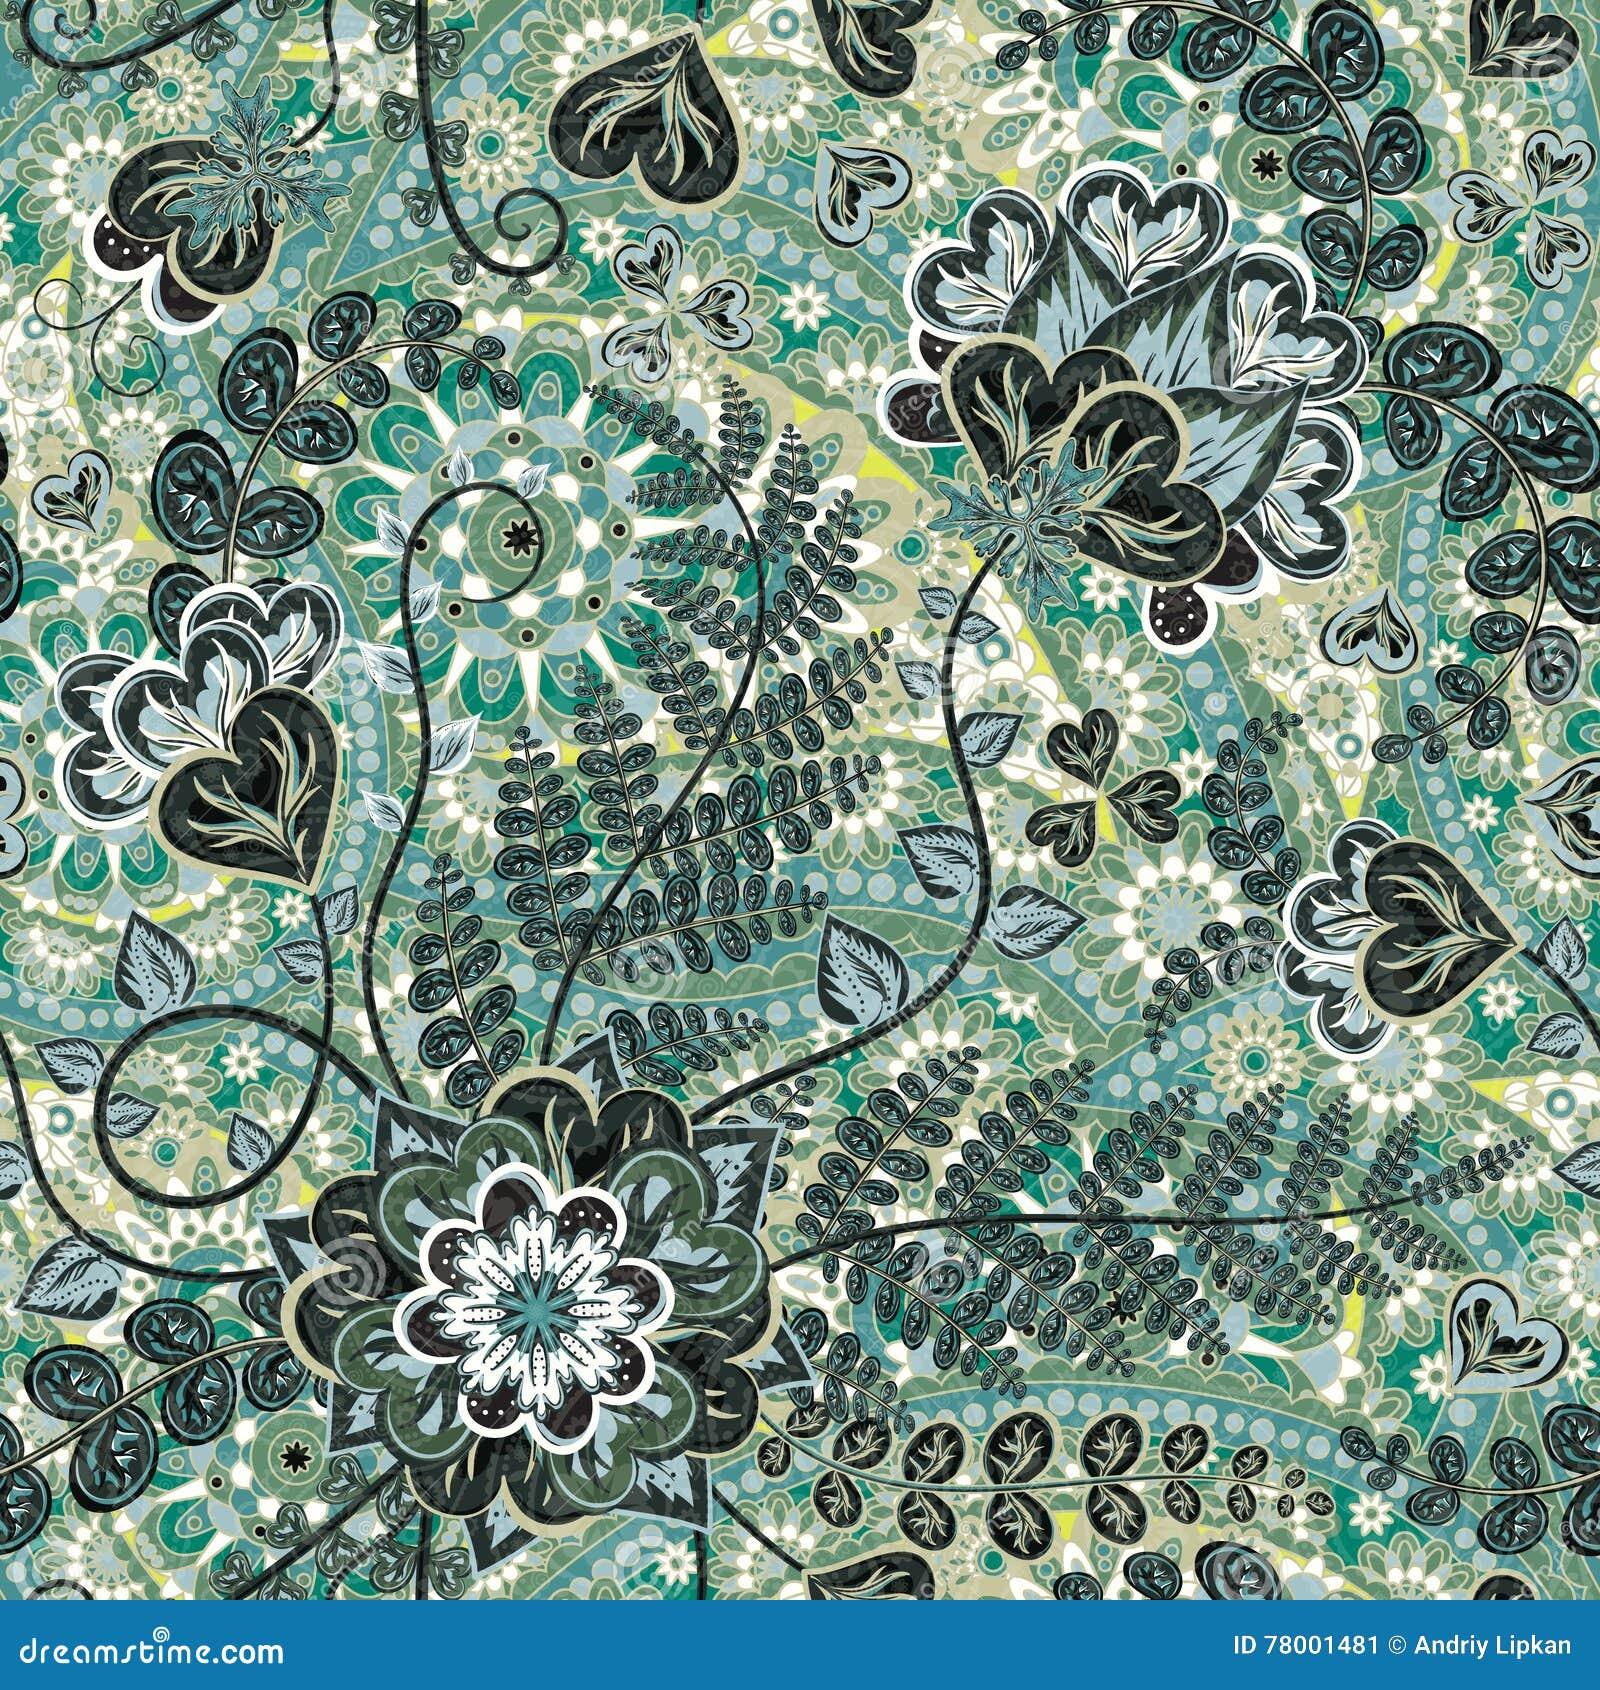 Batik design royalty free stock photos image 29546988 - Vintage Pattern In Indian Batik Style Floral Vector Background Stock Image